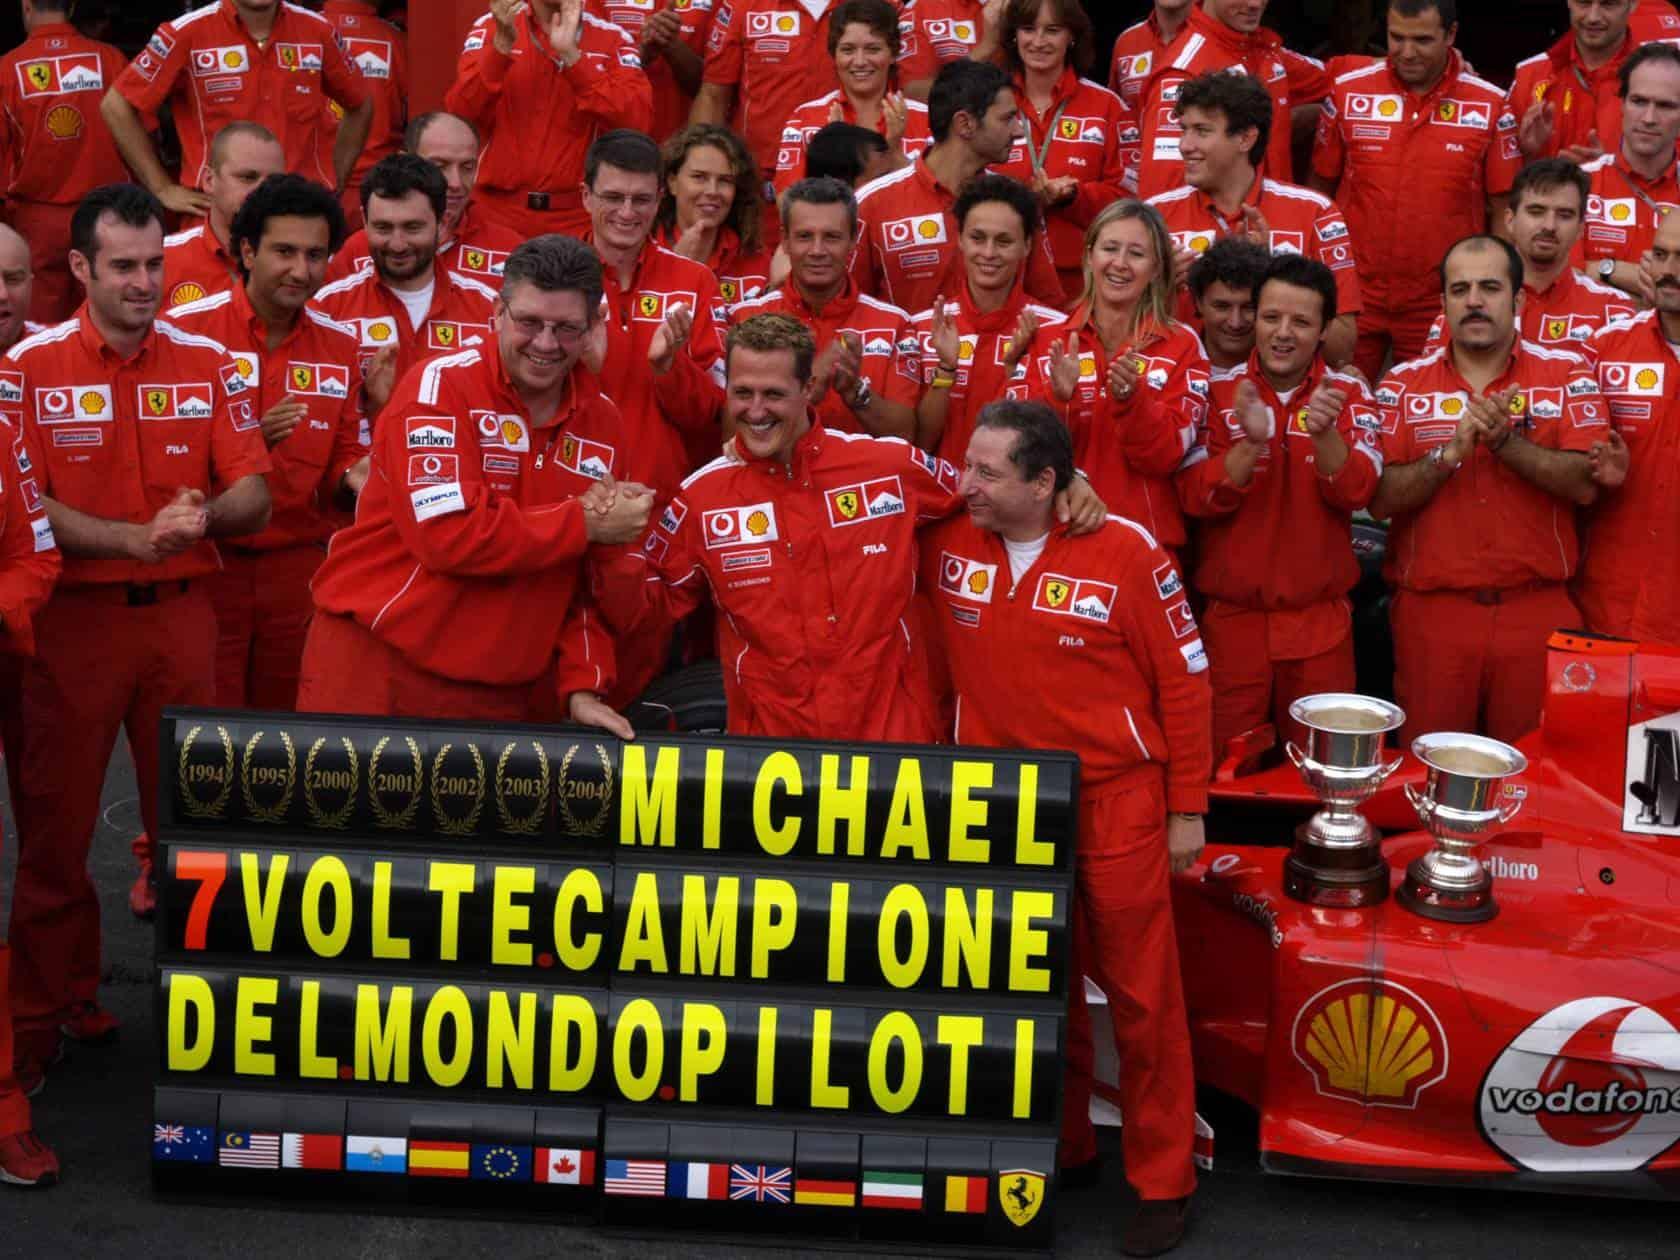 Michael-Schumacher-Ferrari-F2004-Belgian-GP-F1-2004-seventh-title-celebration-Photo-Ferrari.